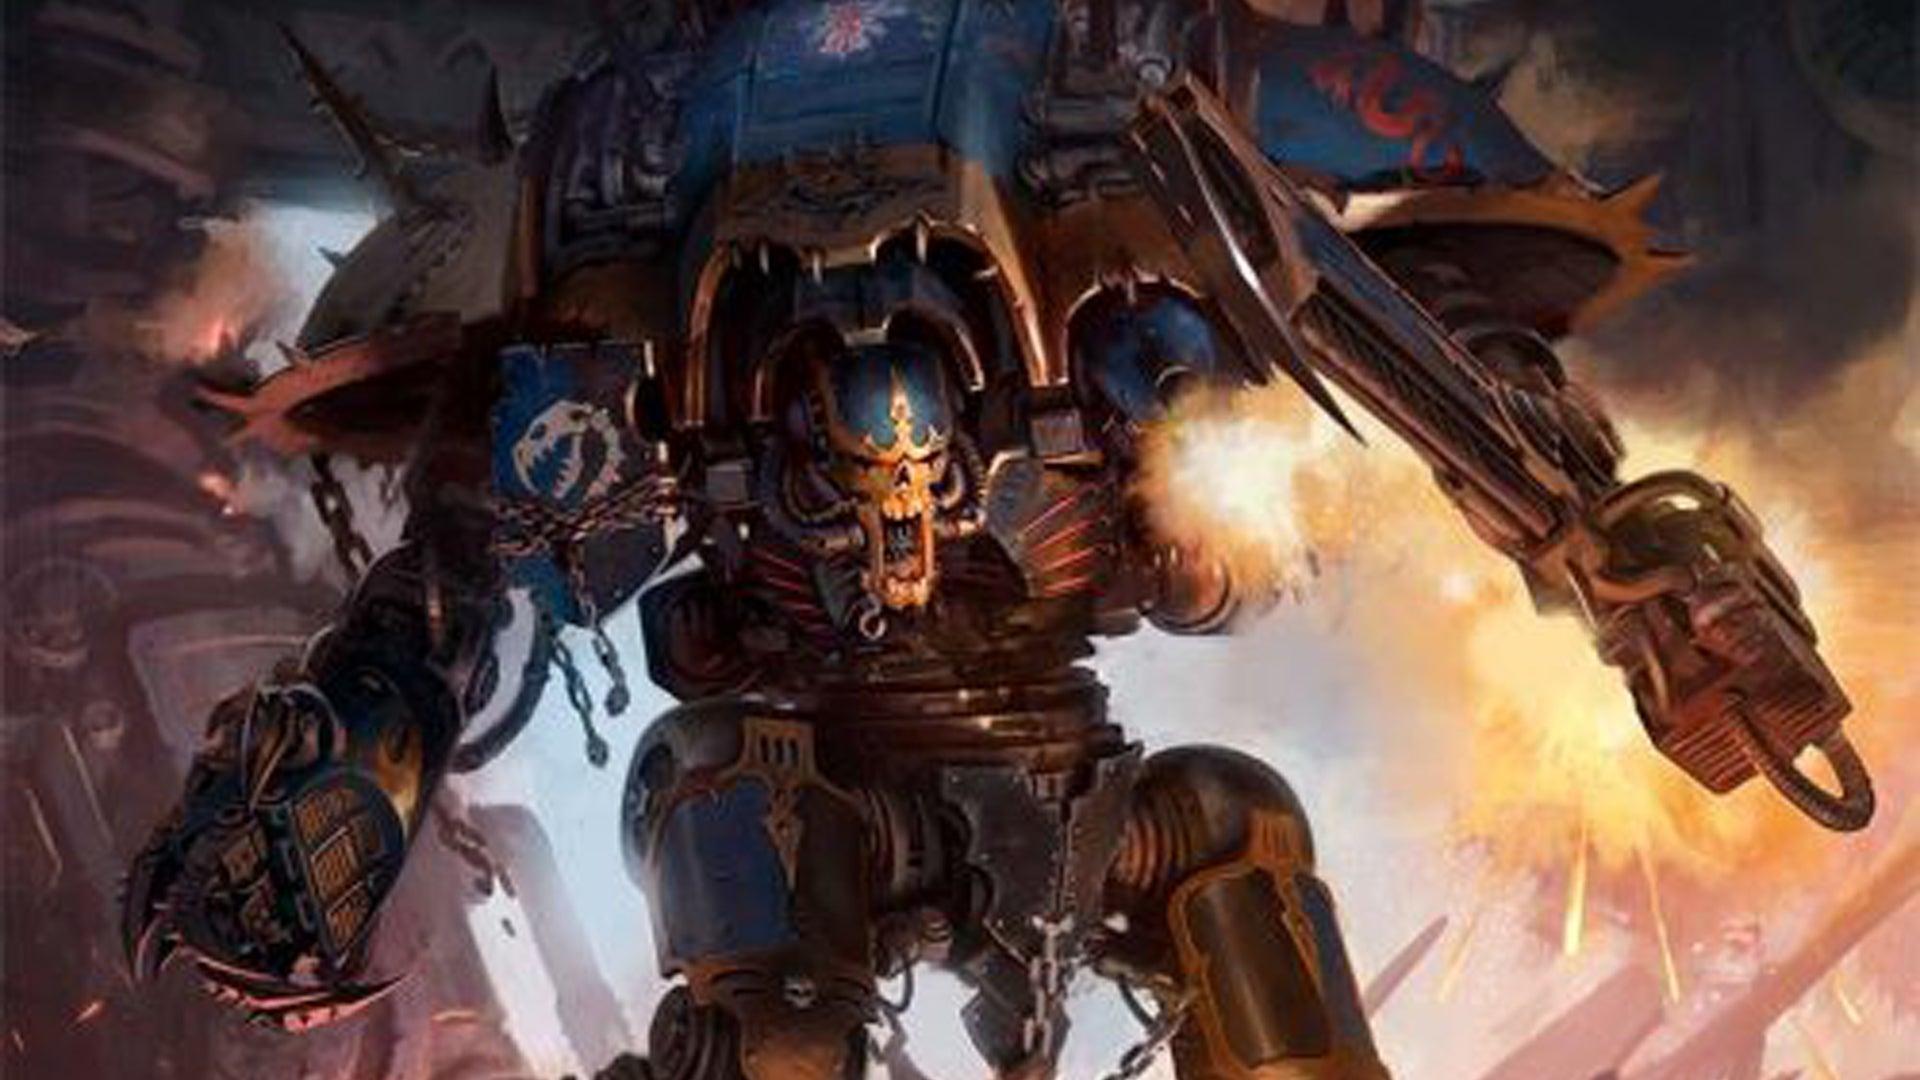 Chaos Knight Codex cover art Warhammer 40K miniatures game